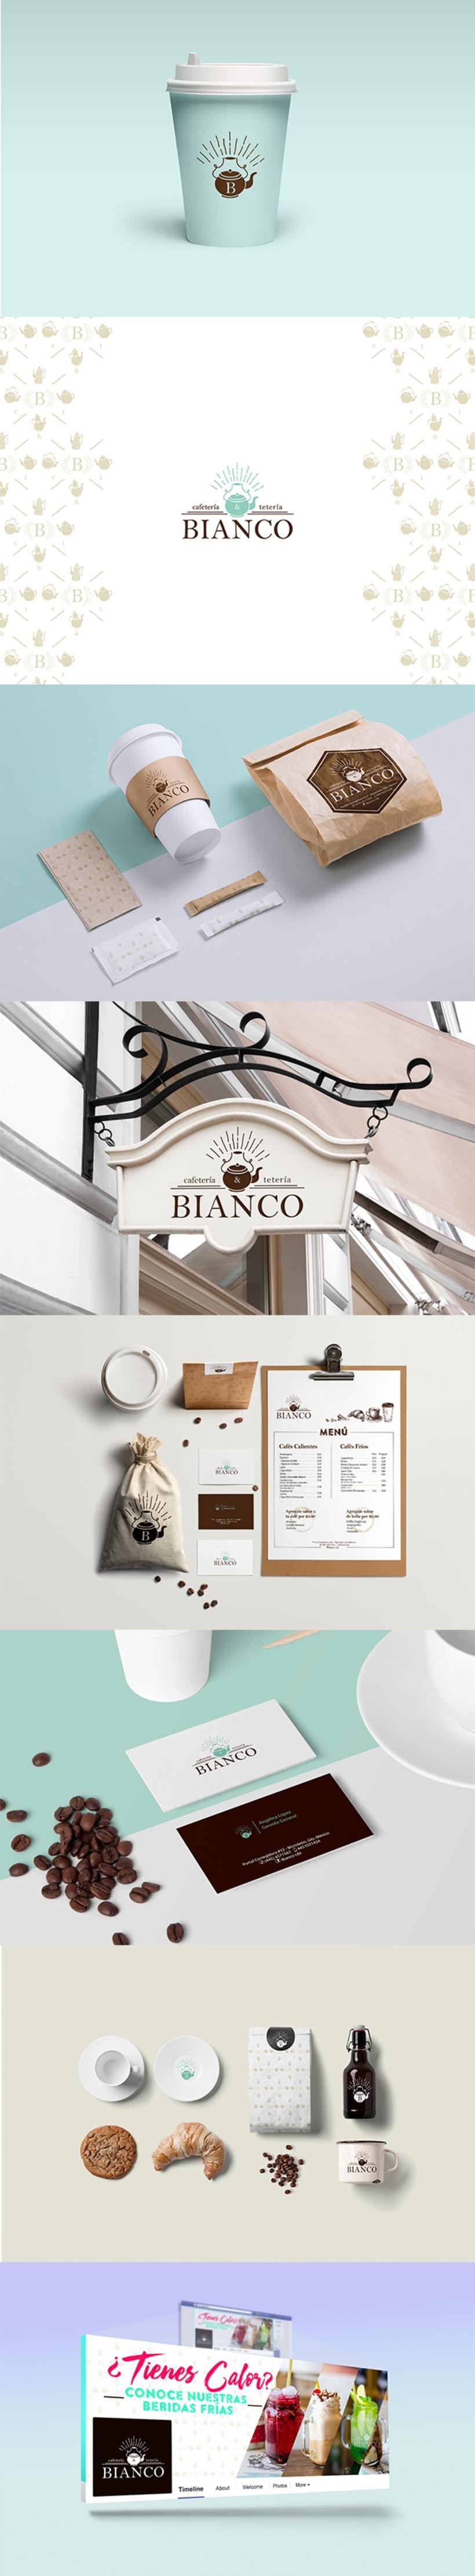 BIANCO c&t -1